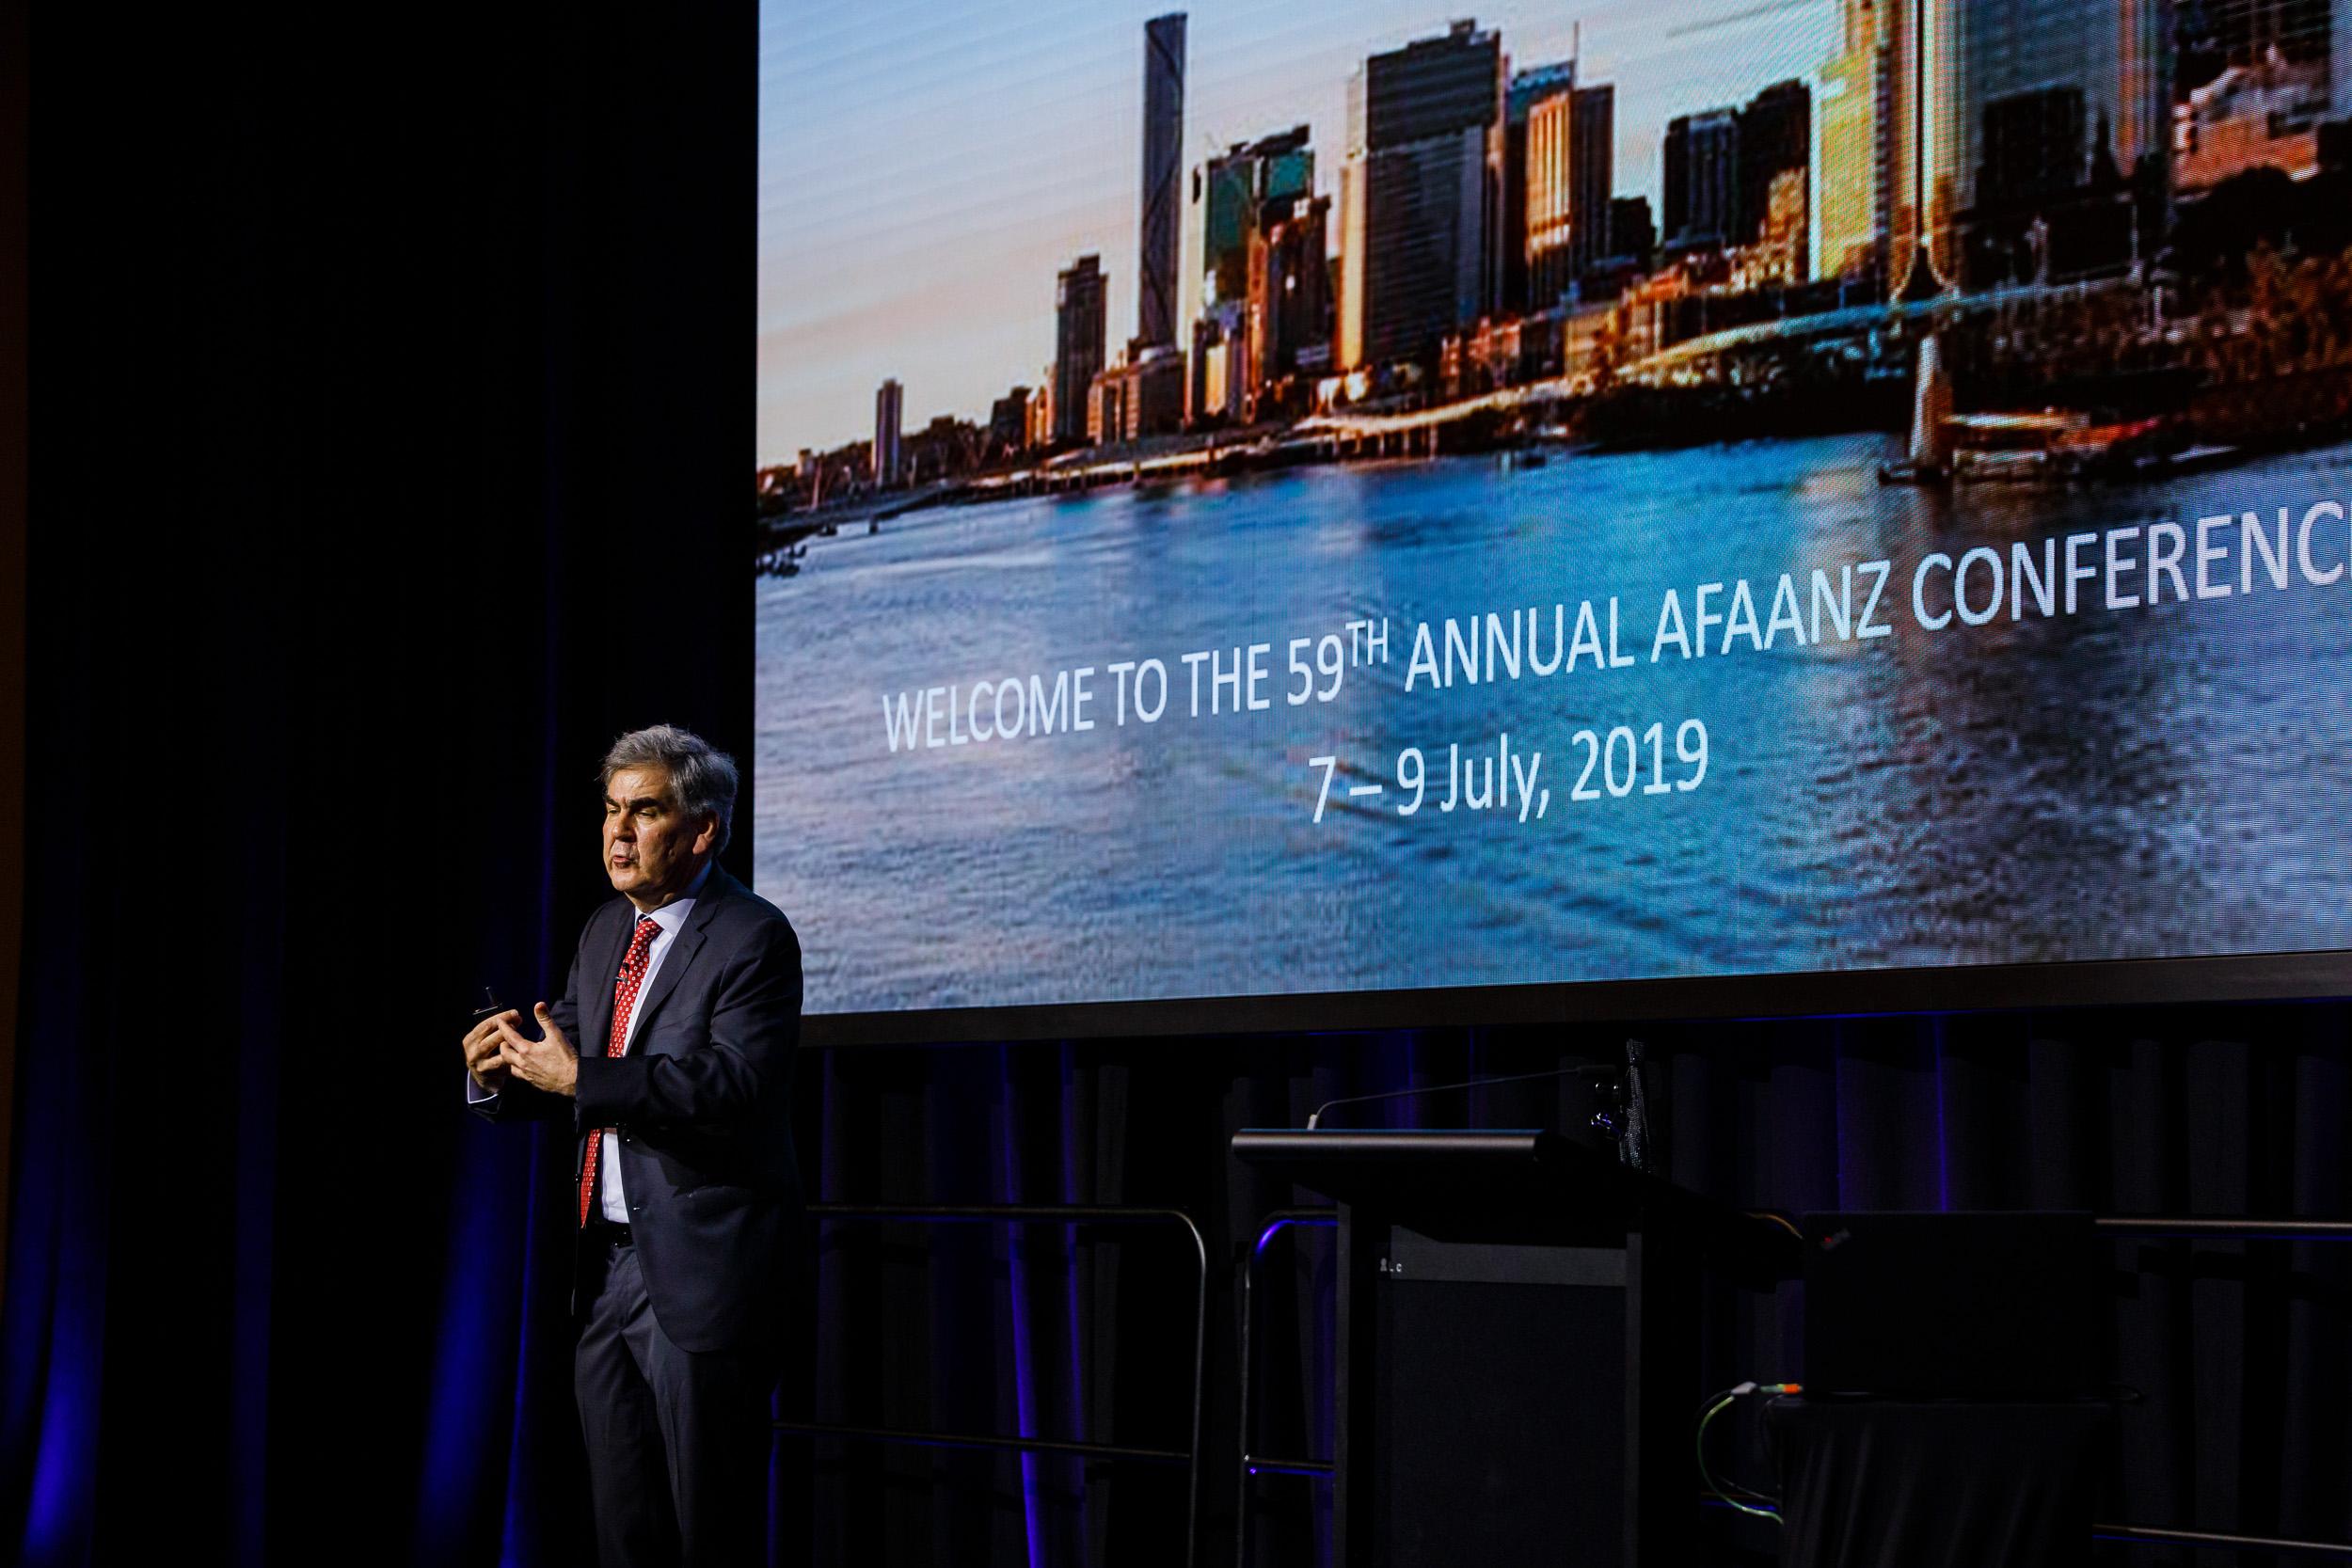 AFAANZ 2019 Conference Sofitel July 2019